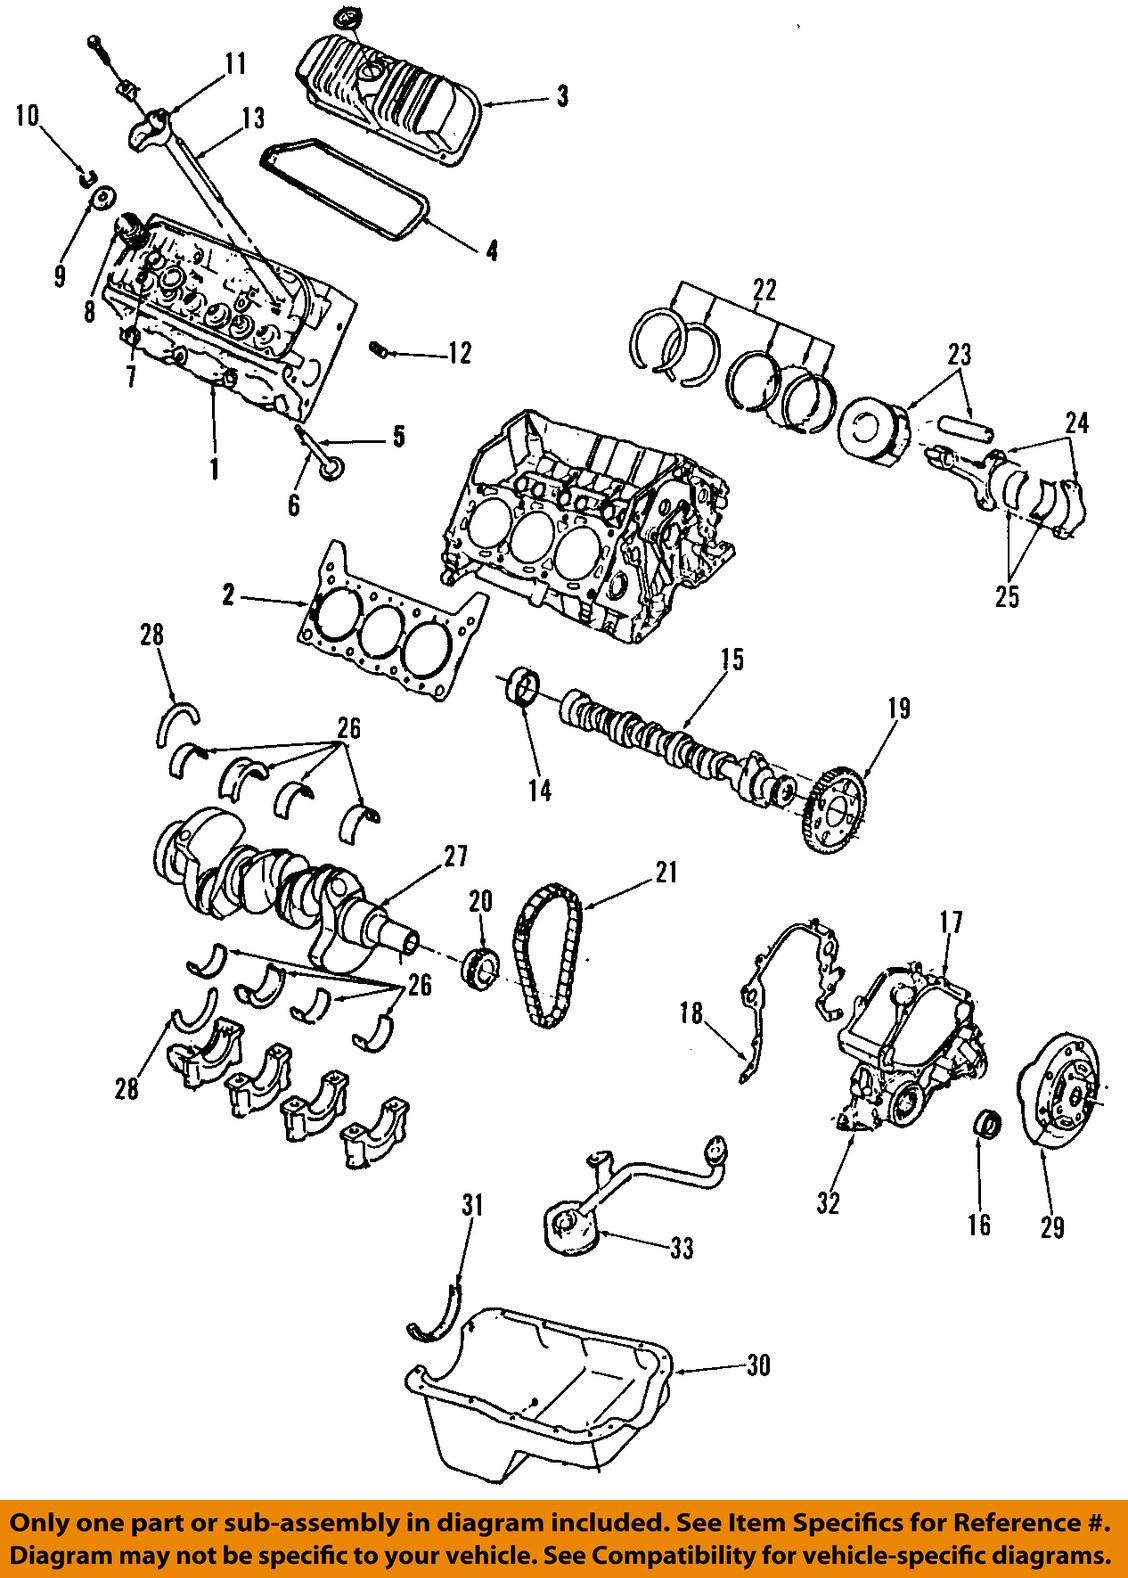 ford oem 01 04 mustang engine harmonic balancer 1r3z6b321ba image is loading ford oem 01 04 mustang engine harmonic balancer